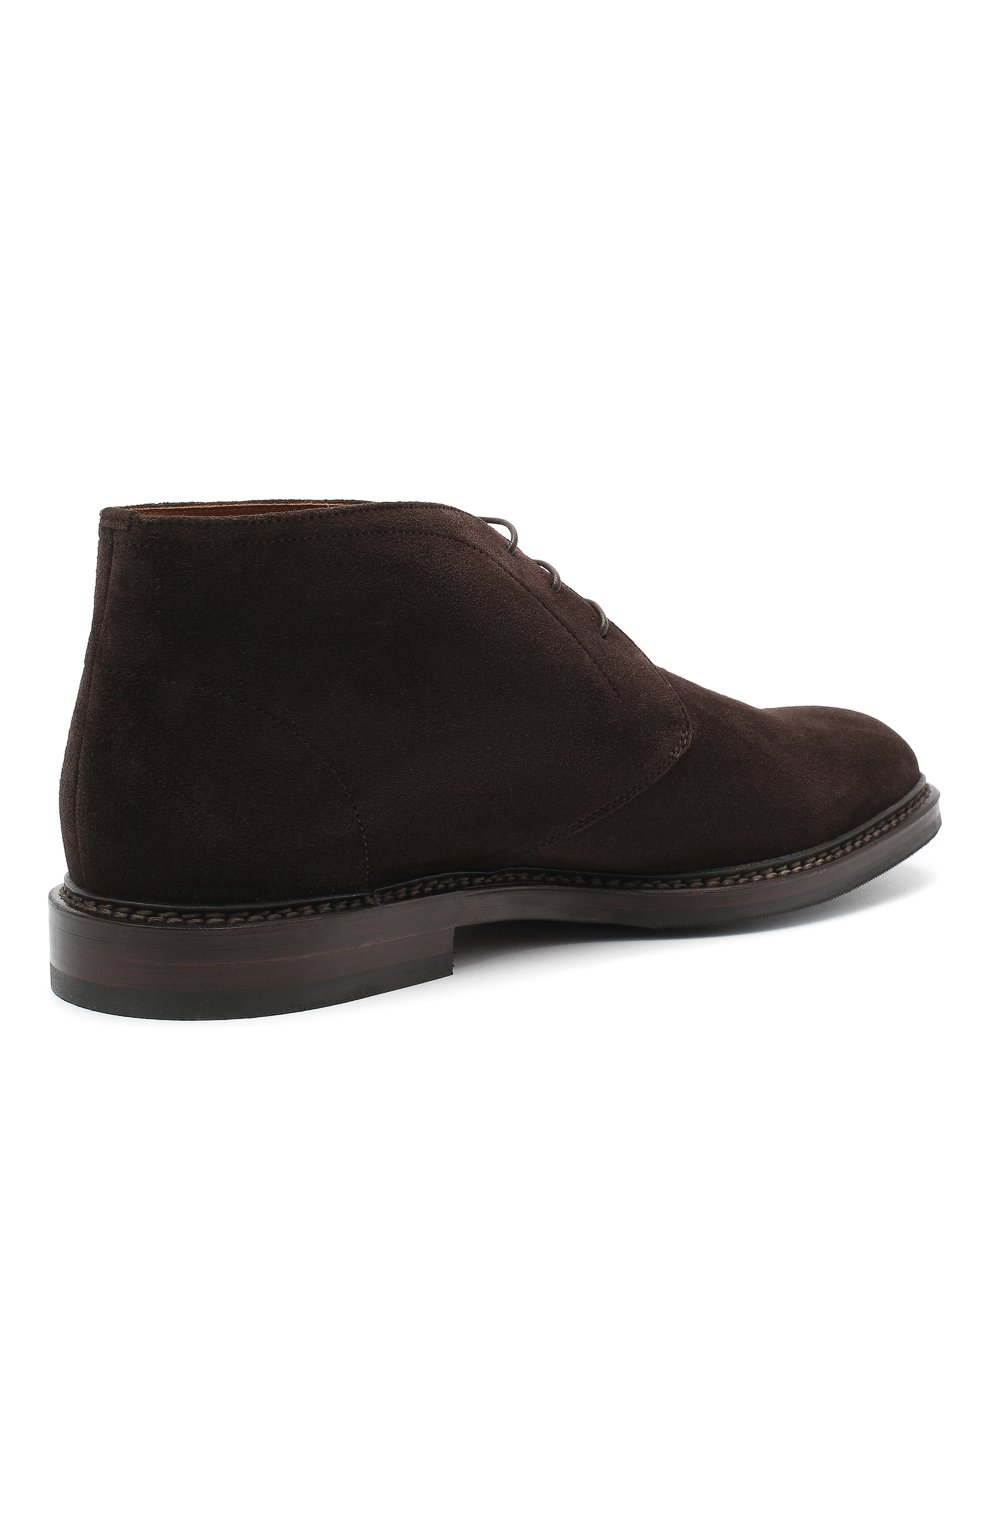 Мужские замшевые ботинки BRUNELLO CUCINELLI темно-коричневого цвета, арт. MZUJCAU892 | Фото 4